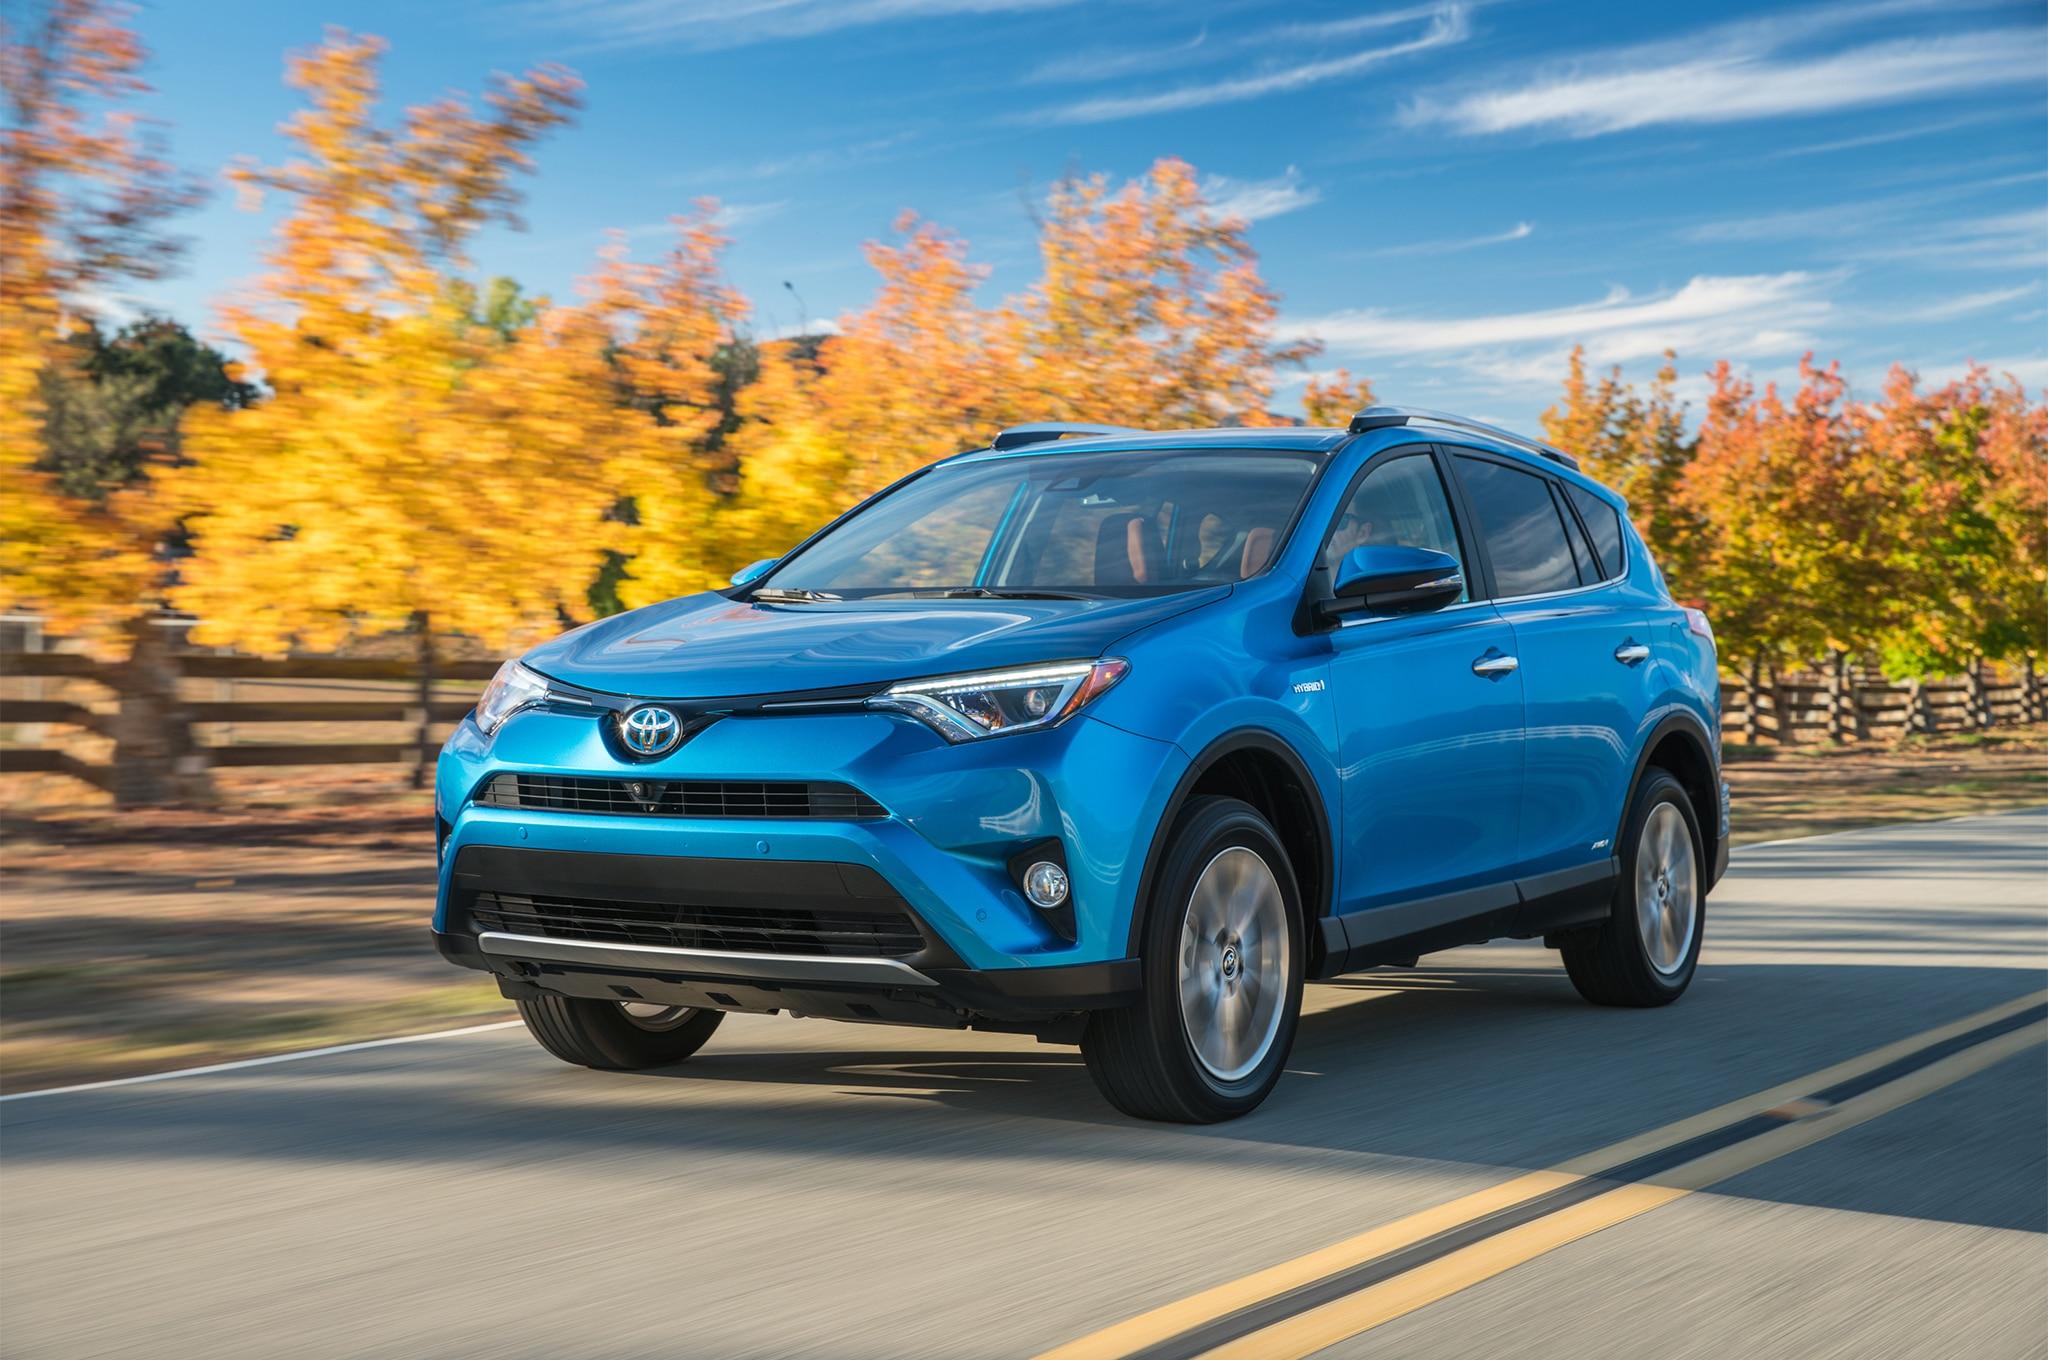 2017 Toyota Rav4 Hybrid Limited Front Three Quarter In Motion 05